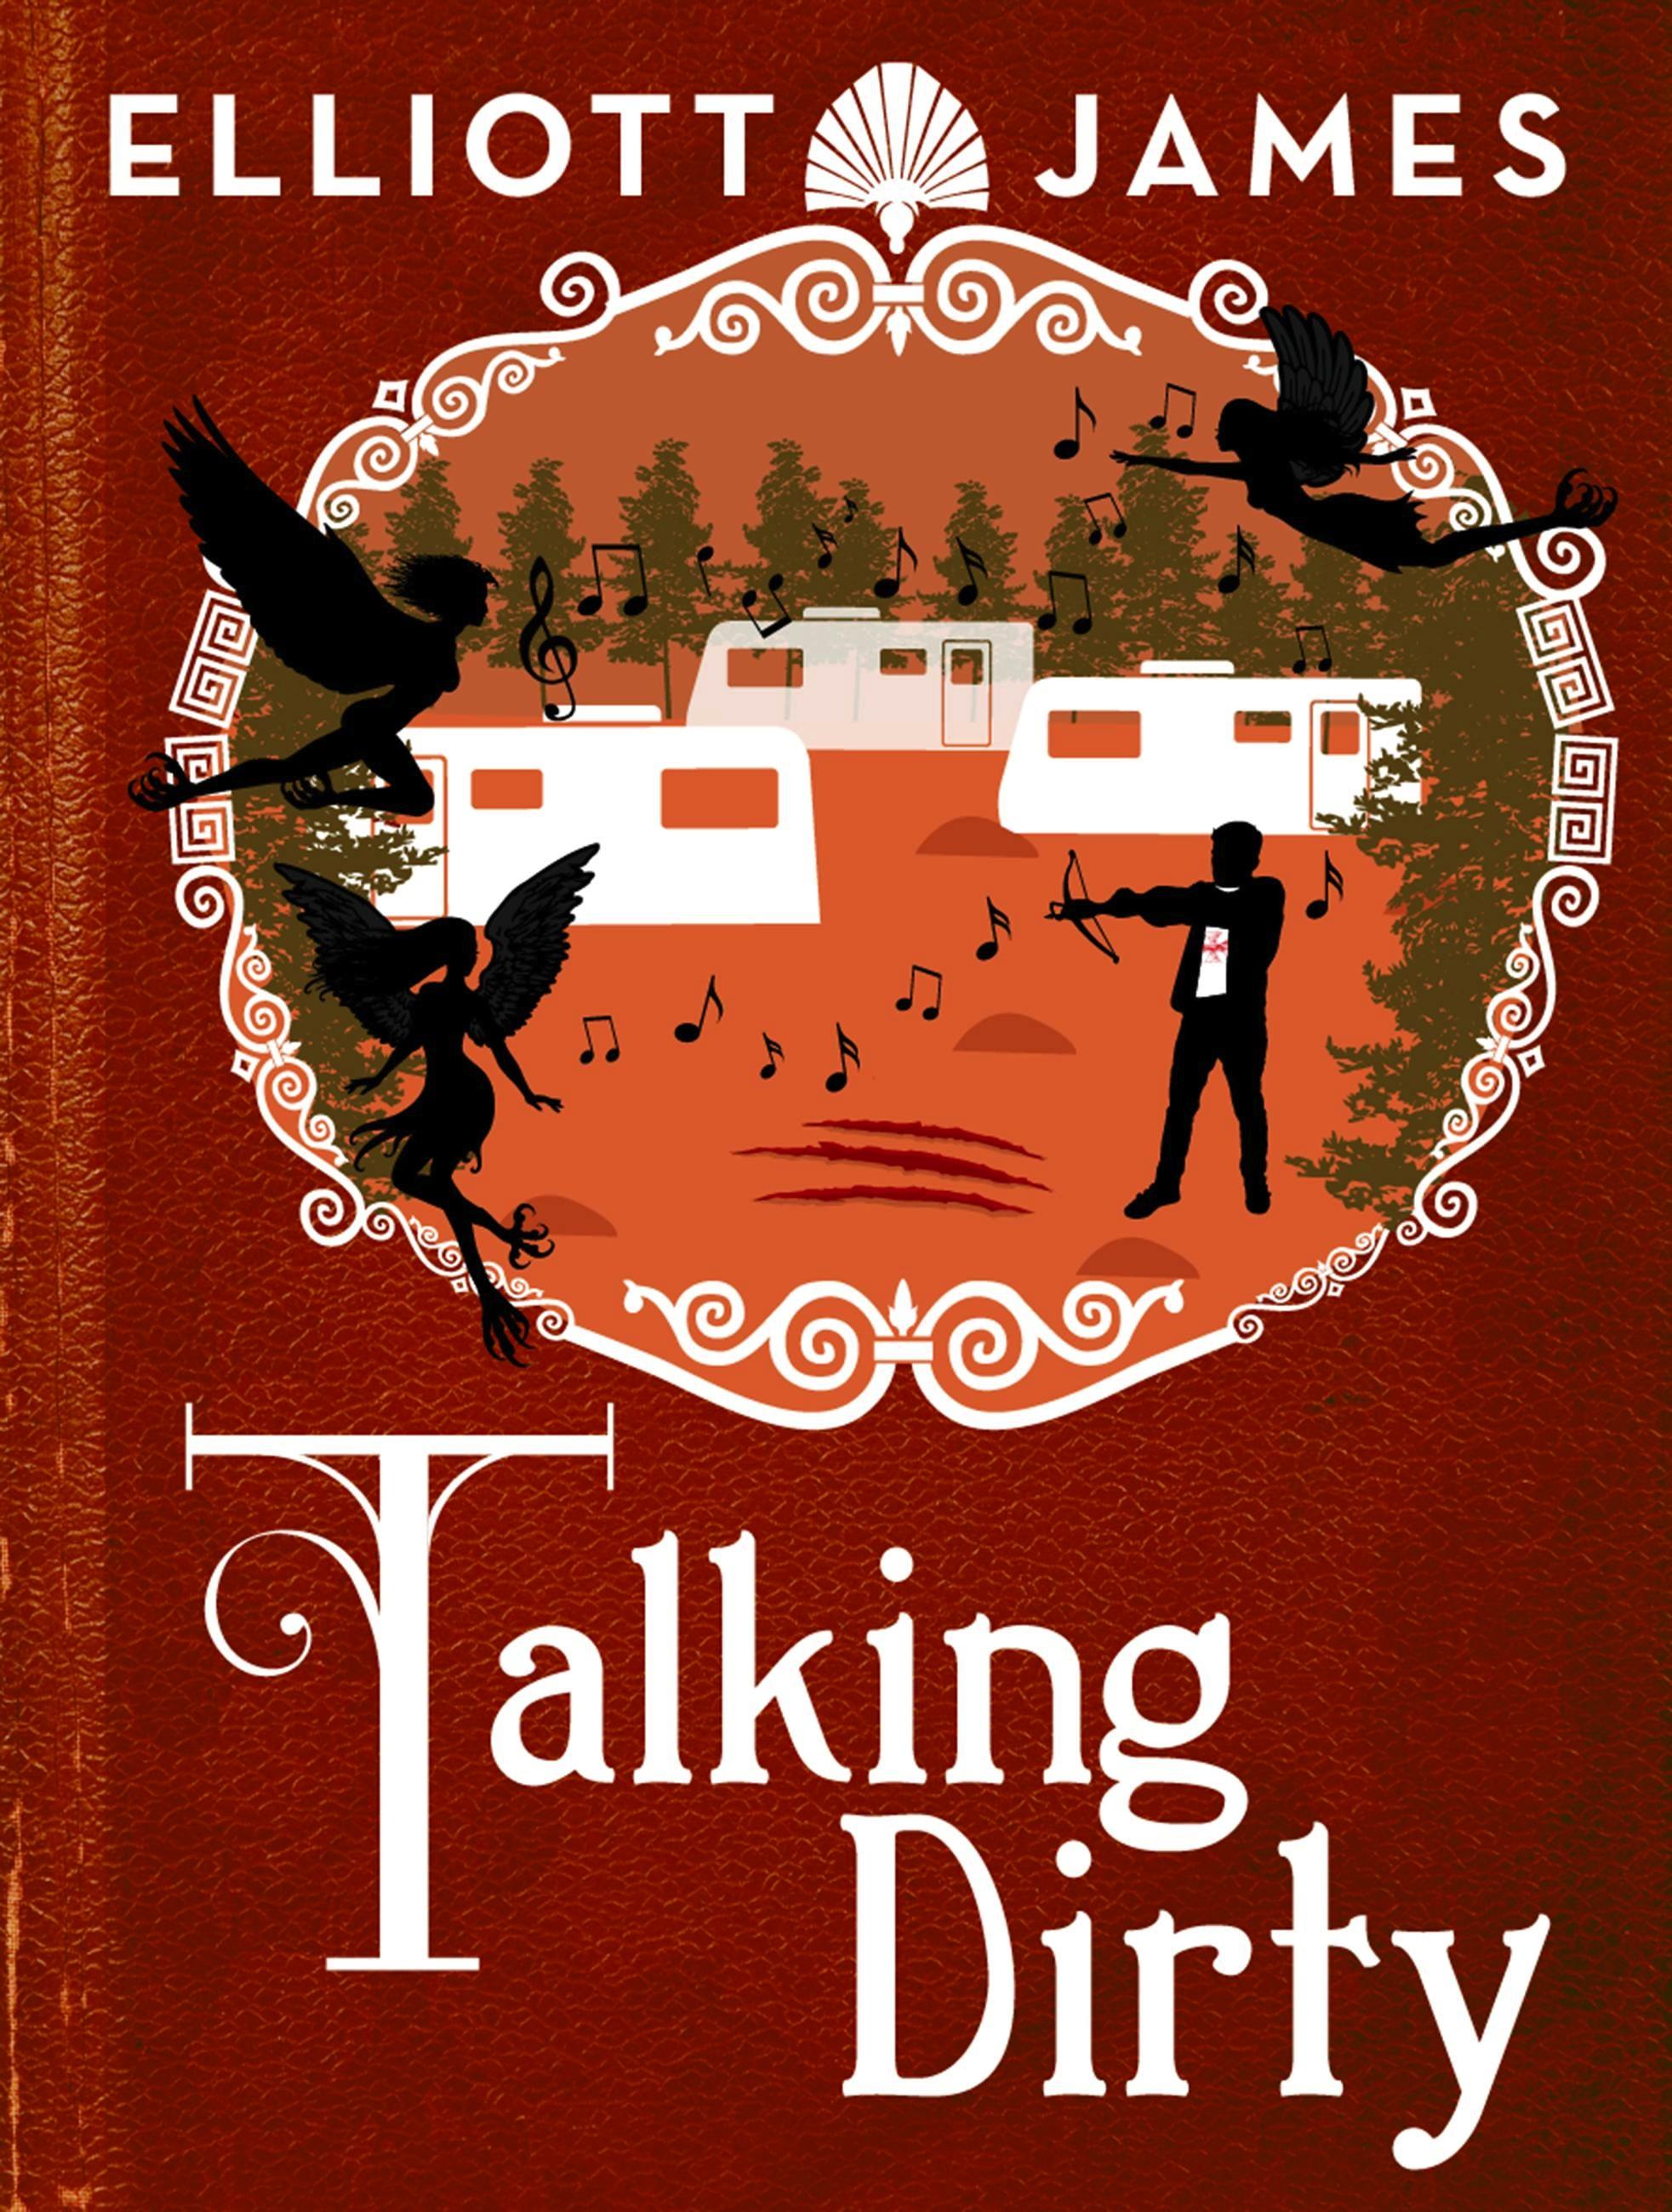 Talking Dirty by Elliott James | Hachette Book Group